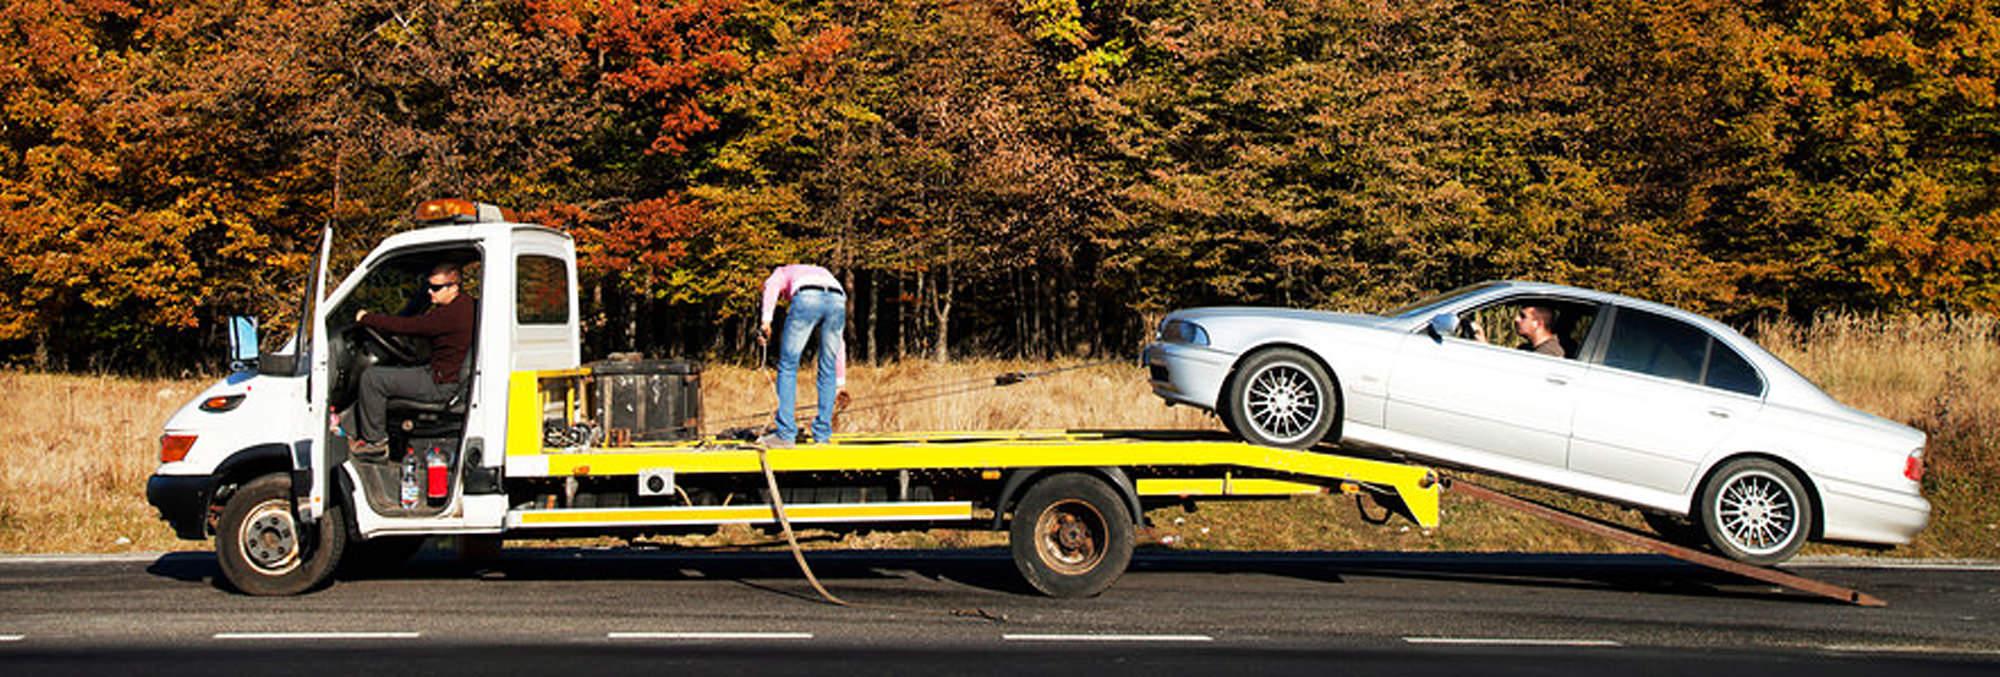 Vehicle Breakdown Recovery in Nottingham